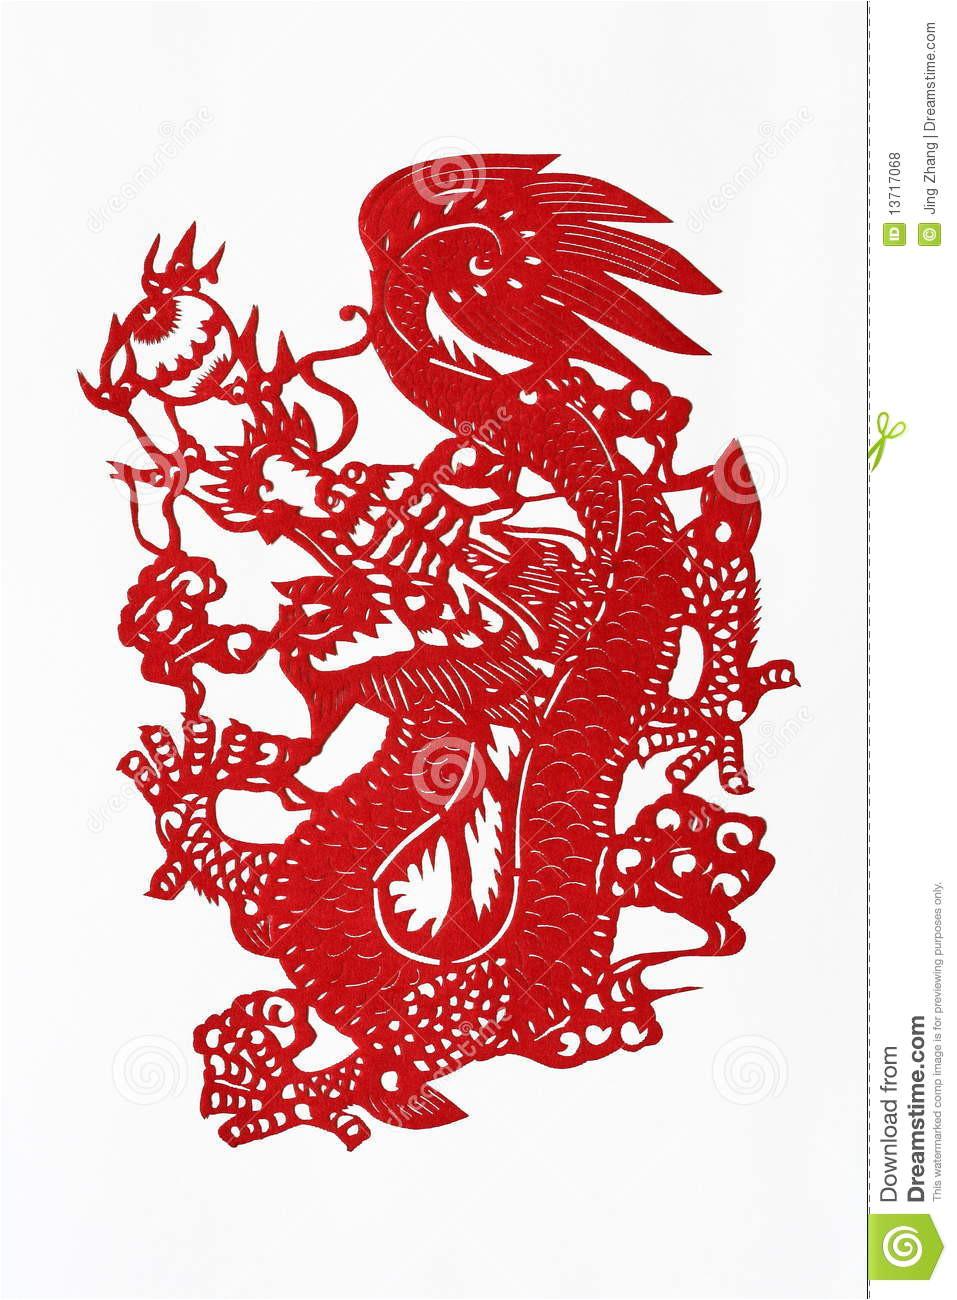 Chinese Paper Cutting Templates Dragon Zodiac Chinese Paper Cutting Dragon Stock Photo Image